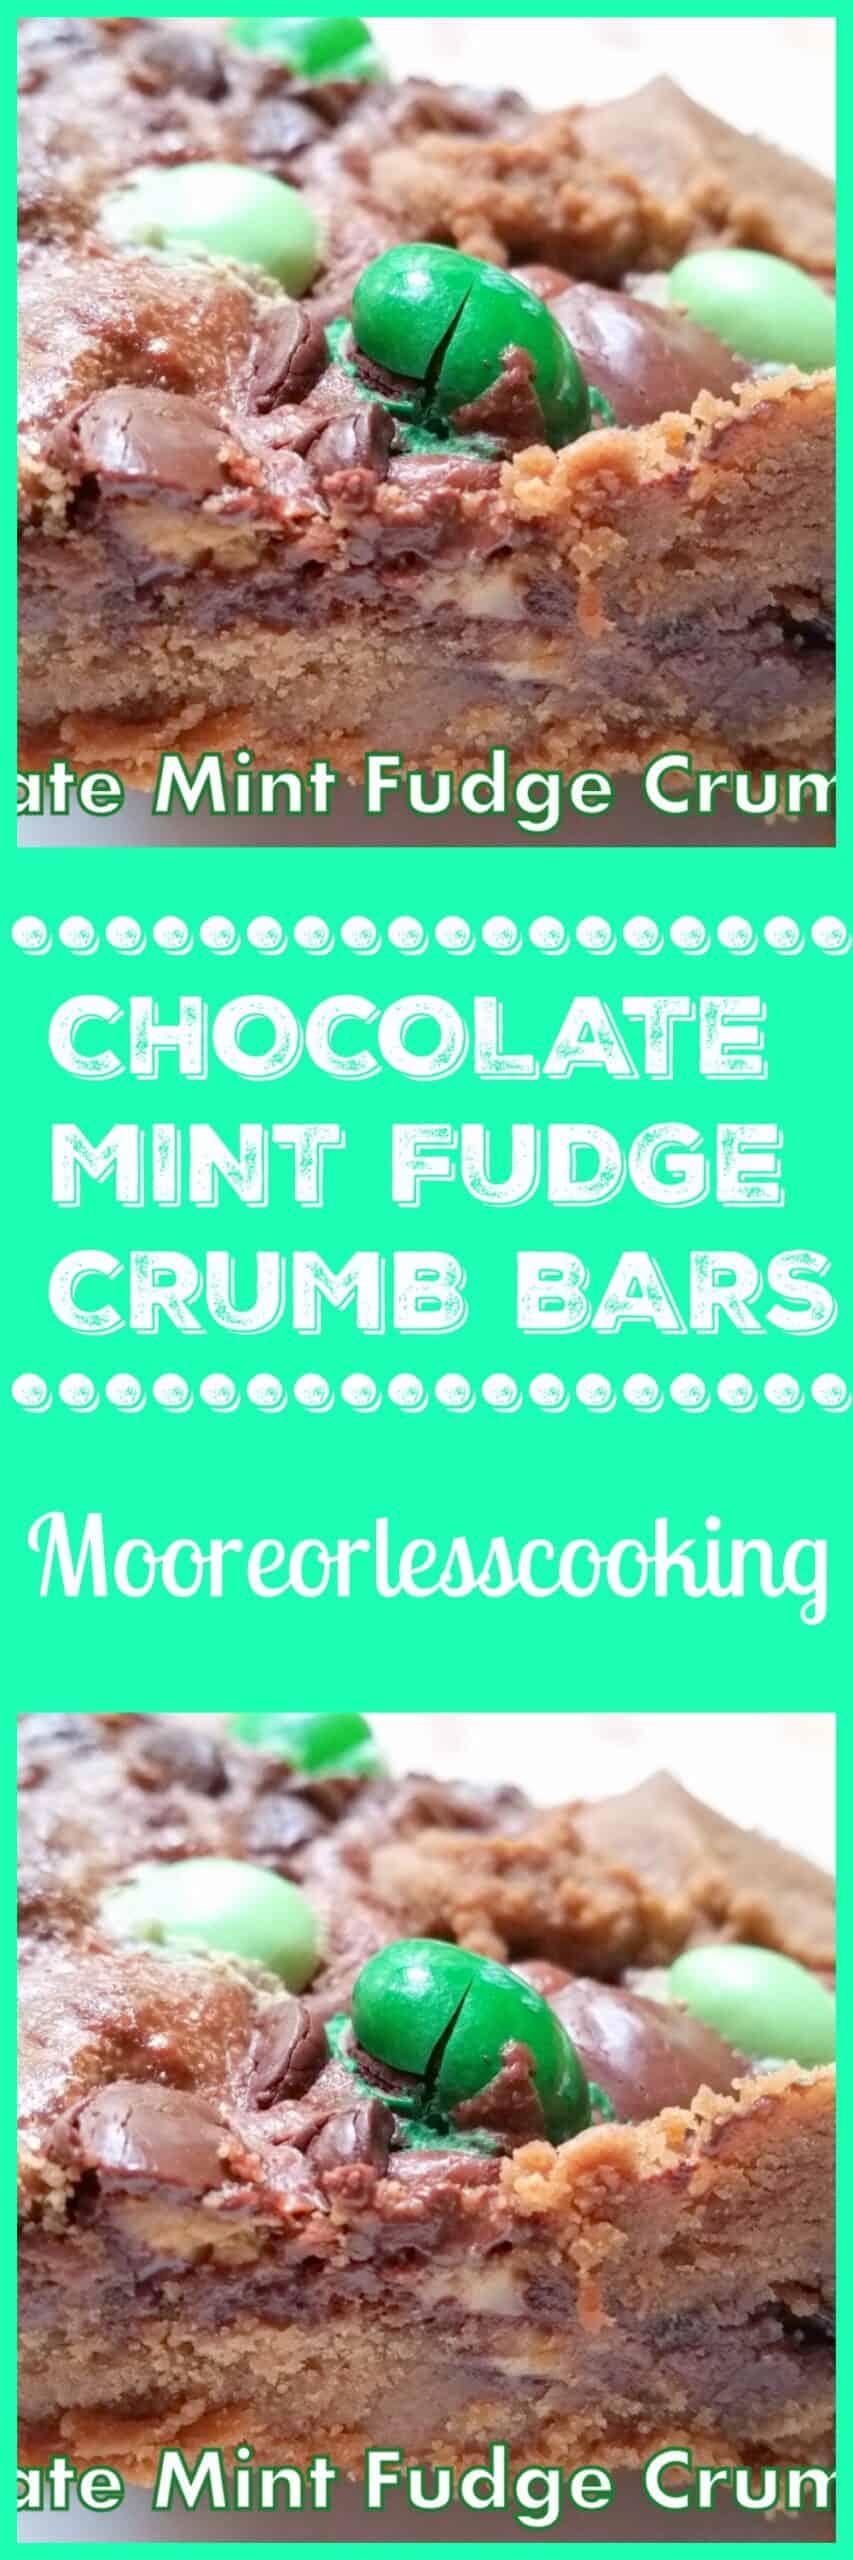 Chocolate Mint Fudge Crumb Bars. #dessertbar #chocolate #mint #mooreorlesscooking via @Mooreorlesscook